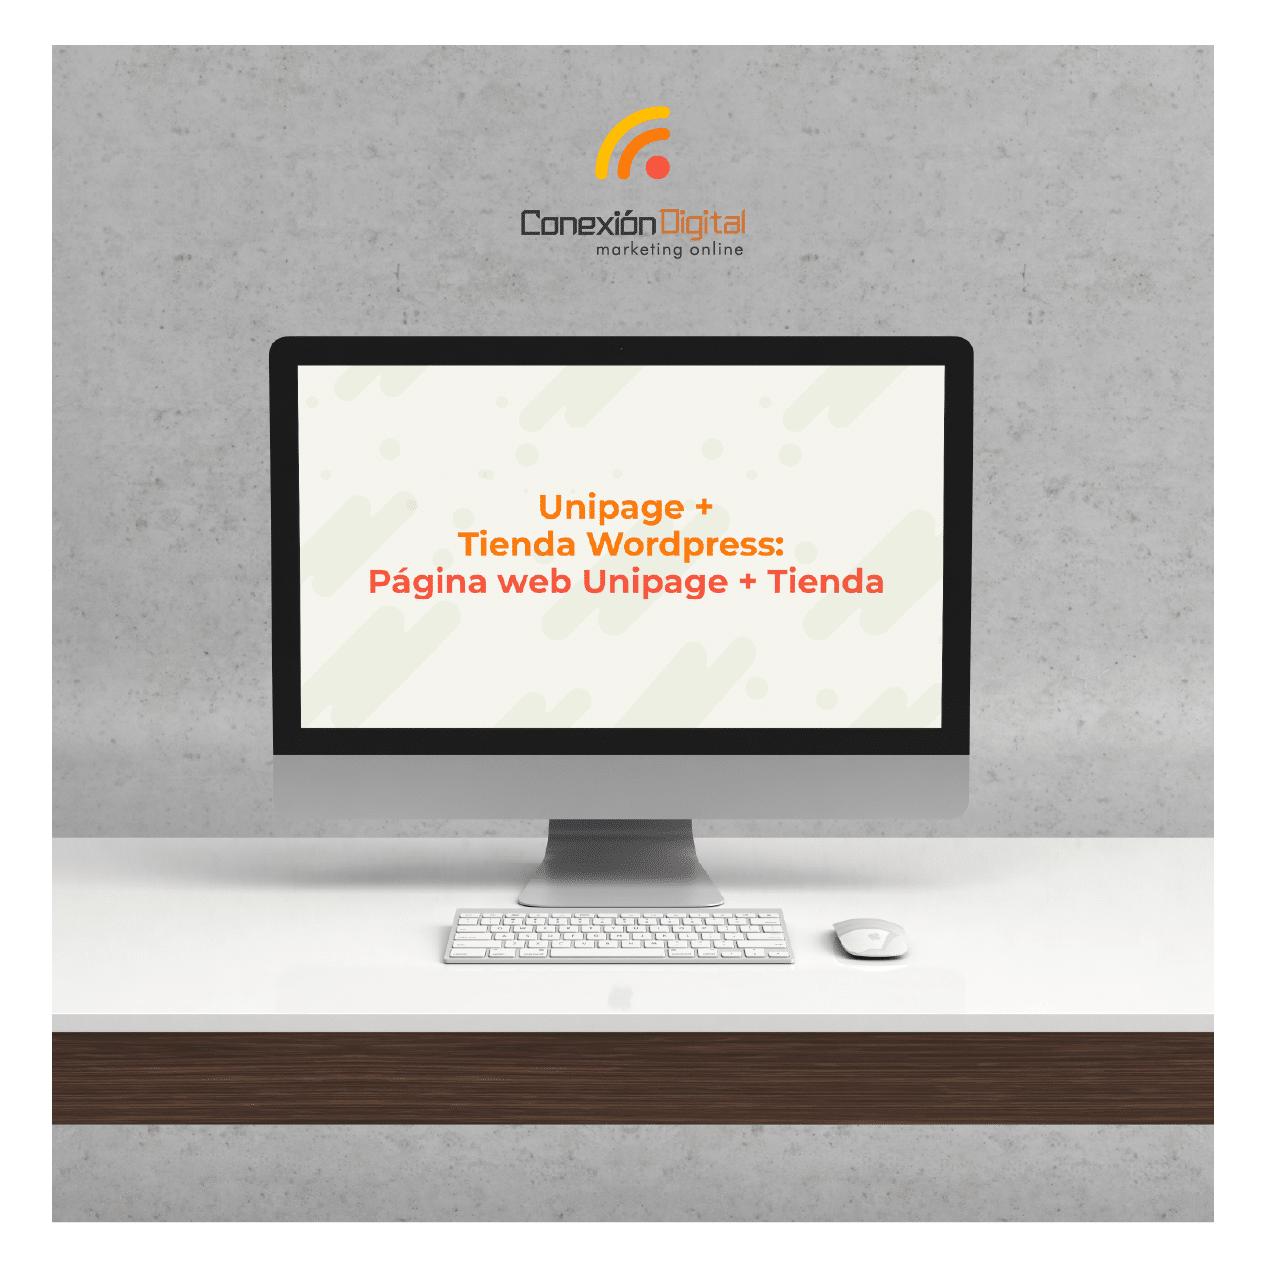 Unipage + Tienda WordPress